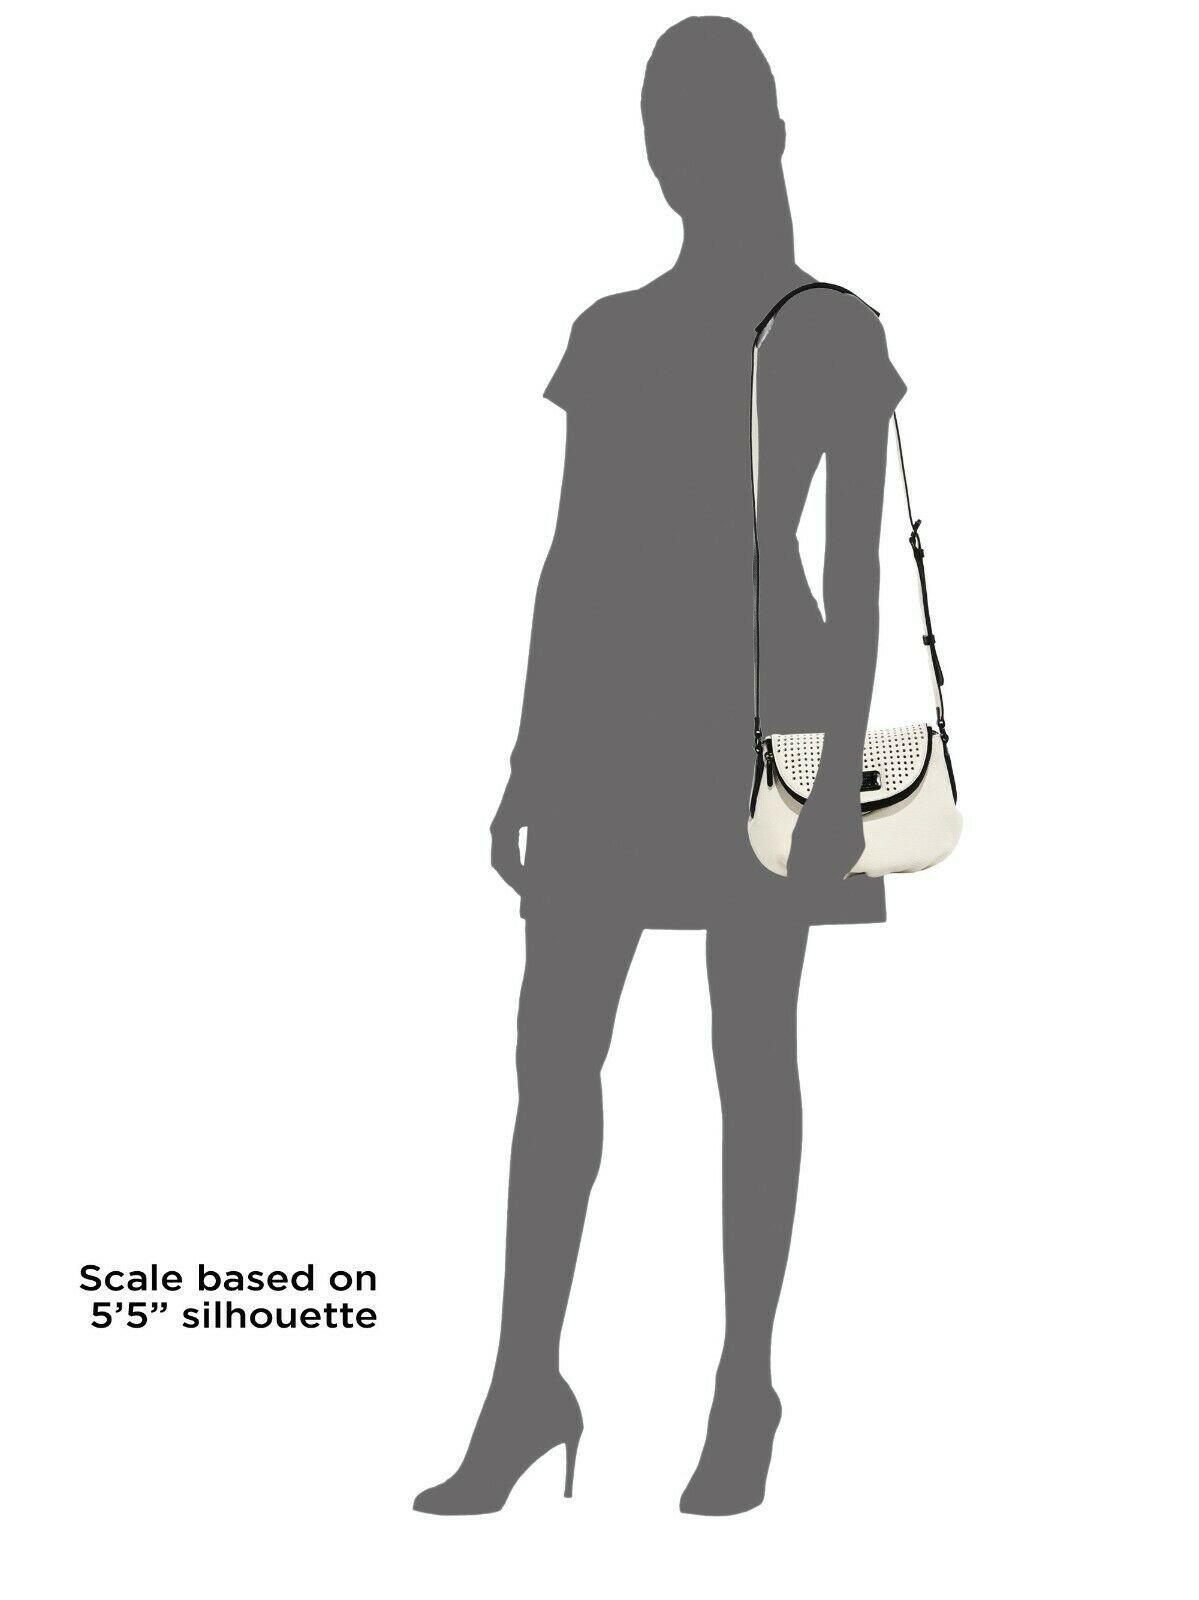 Marc by MARC JACOBS New Q Perforated Mini Natasha Bag  Black/Milk image 2